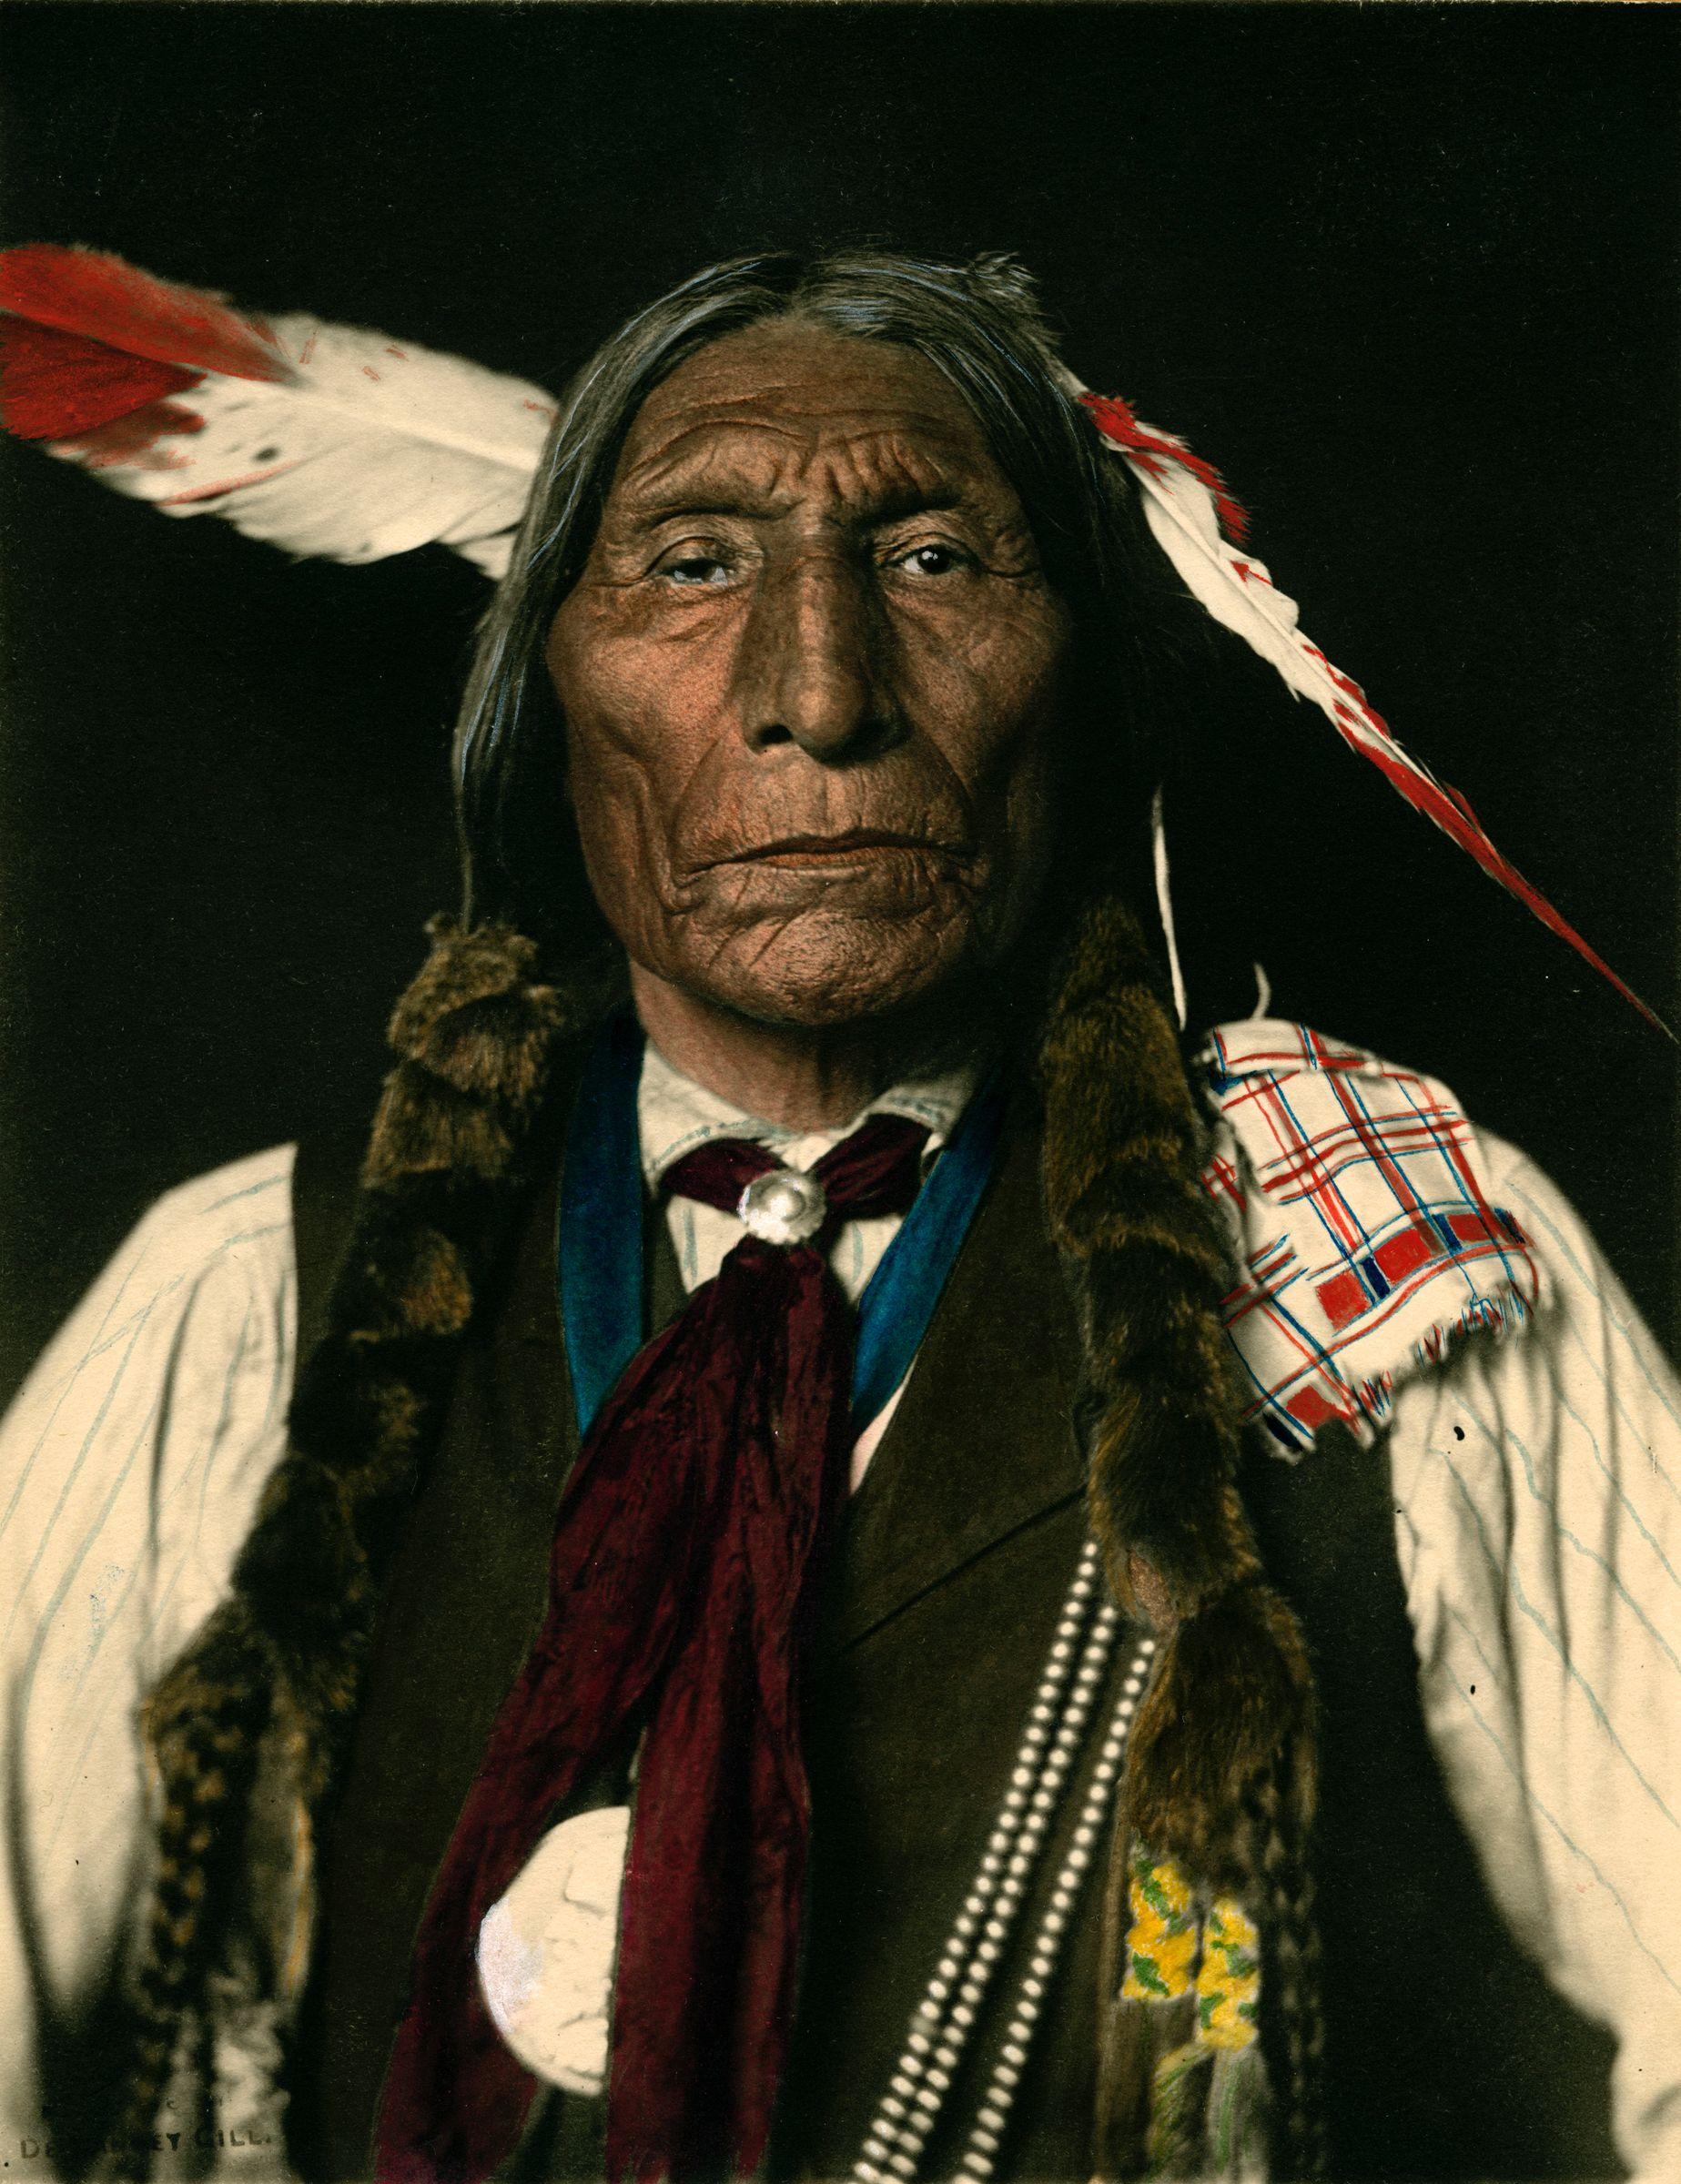 Hoiio Wotoma Cheyenne Colored Carbon Print Photo